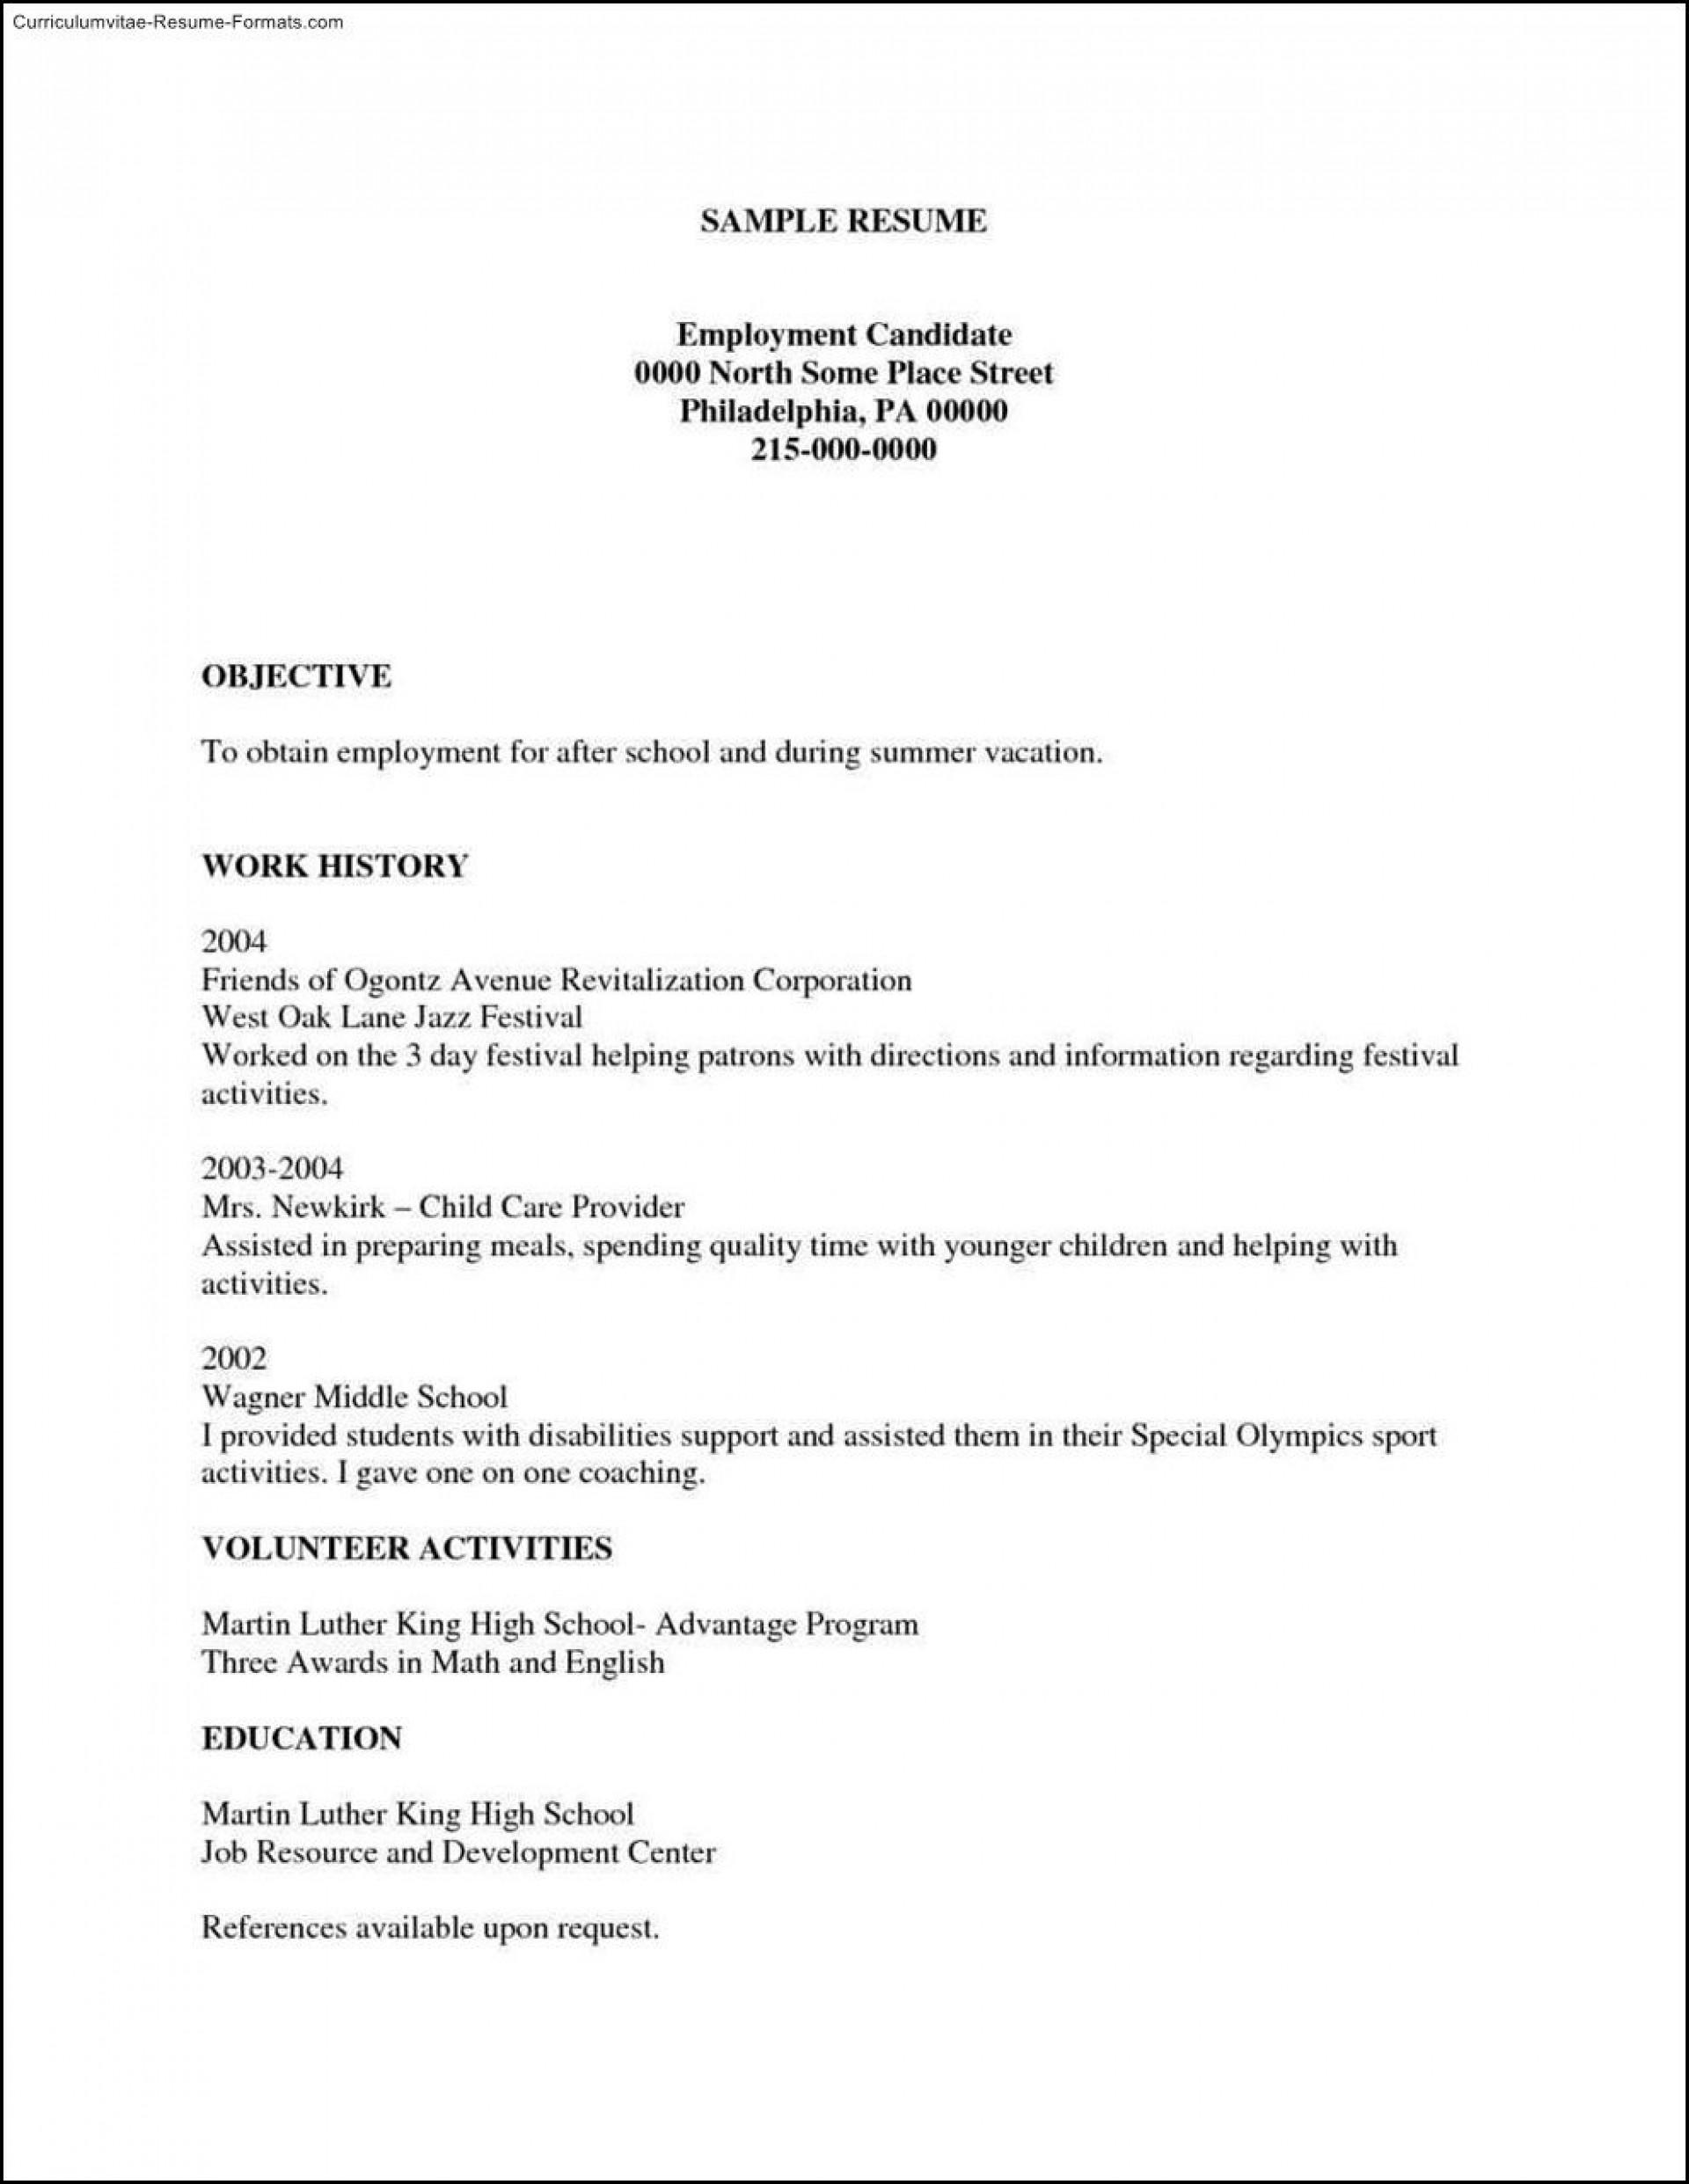 010 Incredible Free Resume Template 2018 Printable Idea 1920